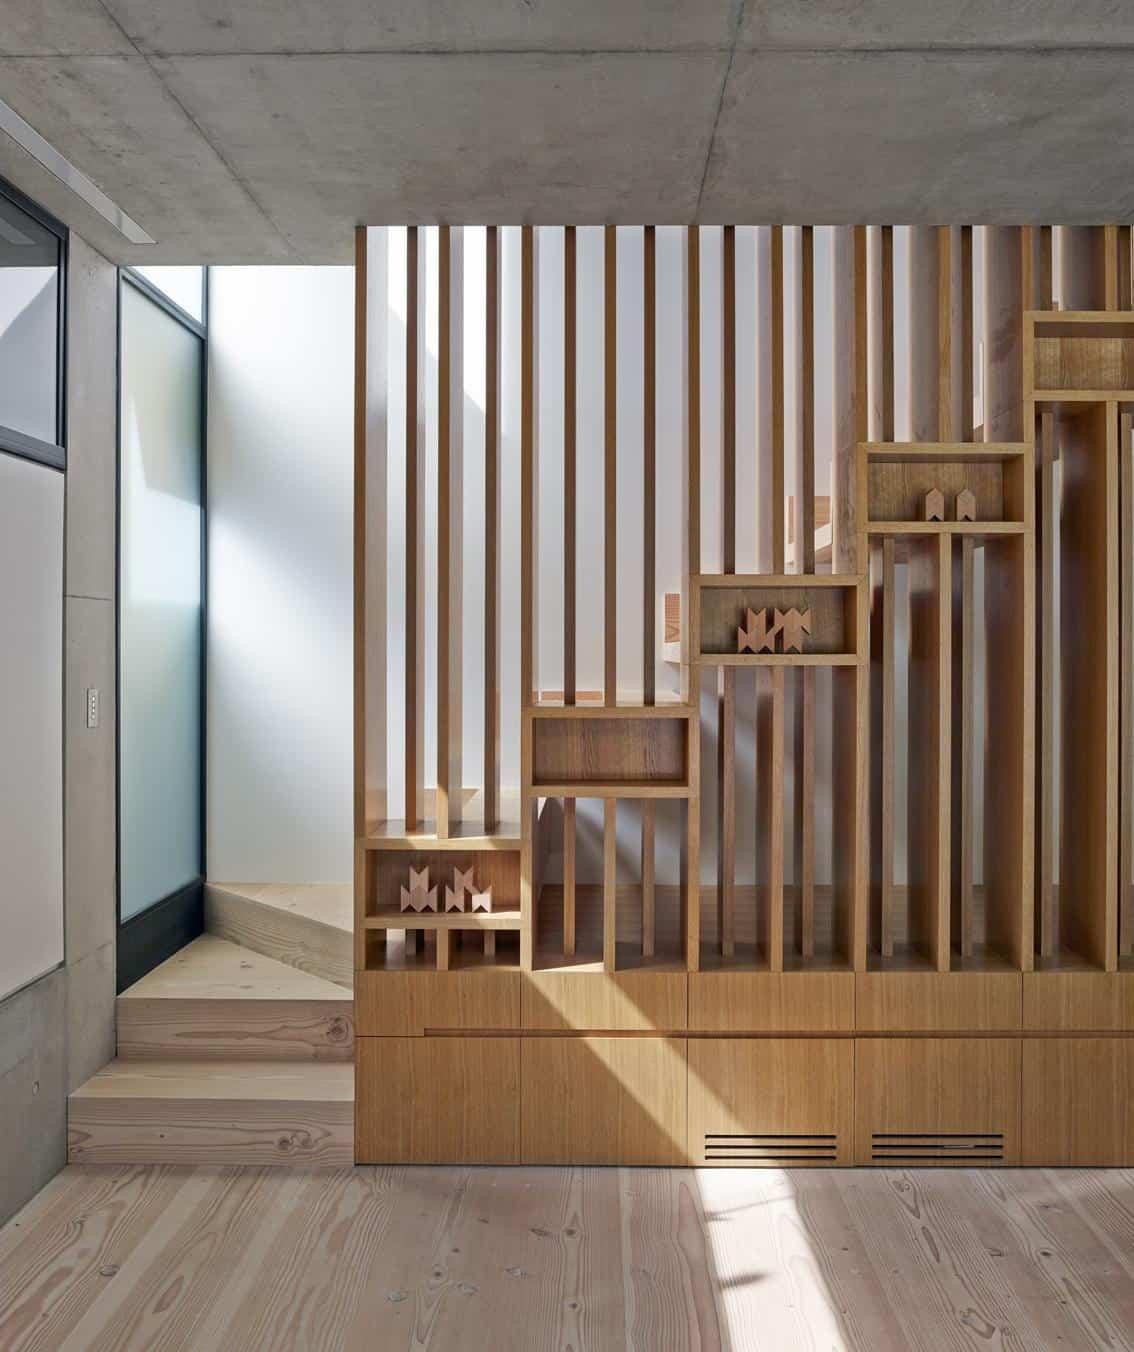 View in gallery 7 staircase designs interesting geometric details jpg